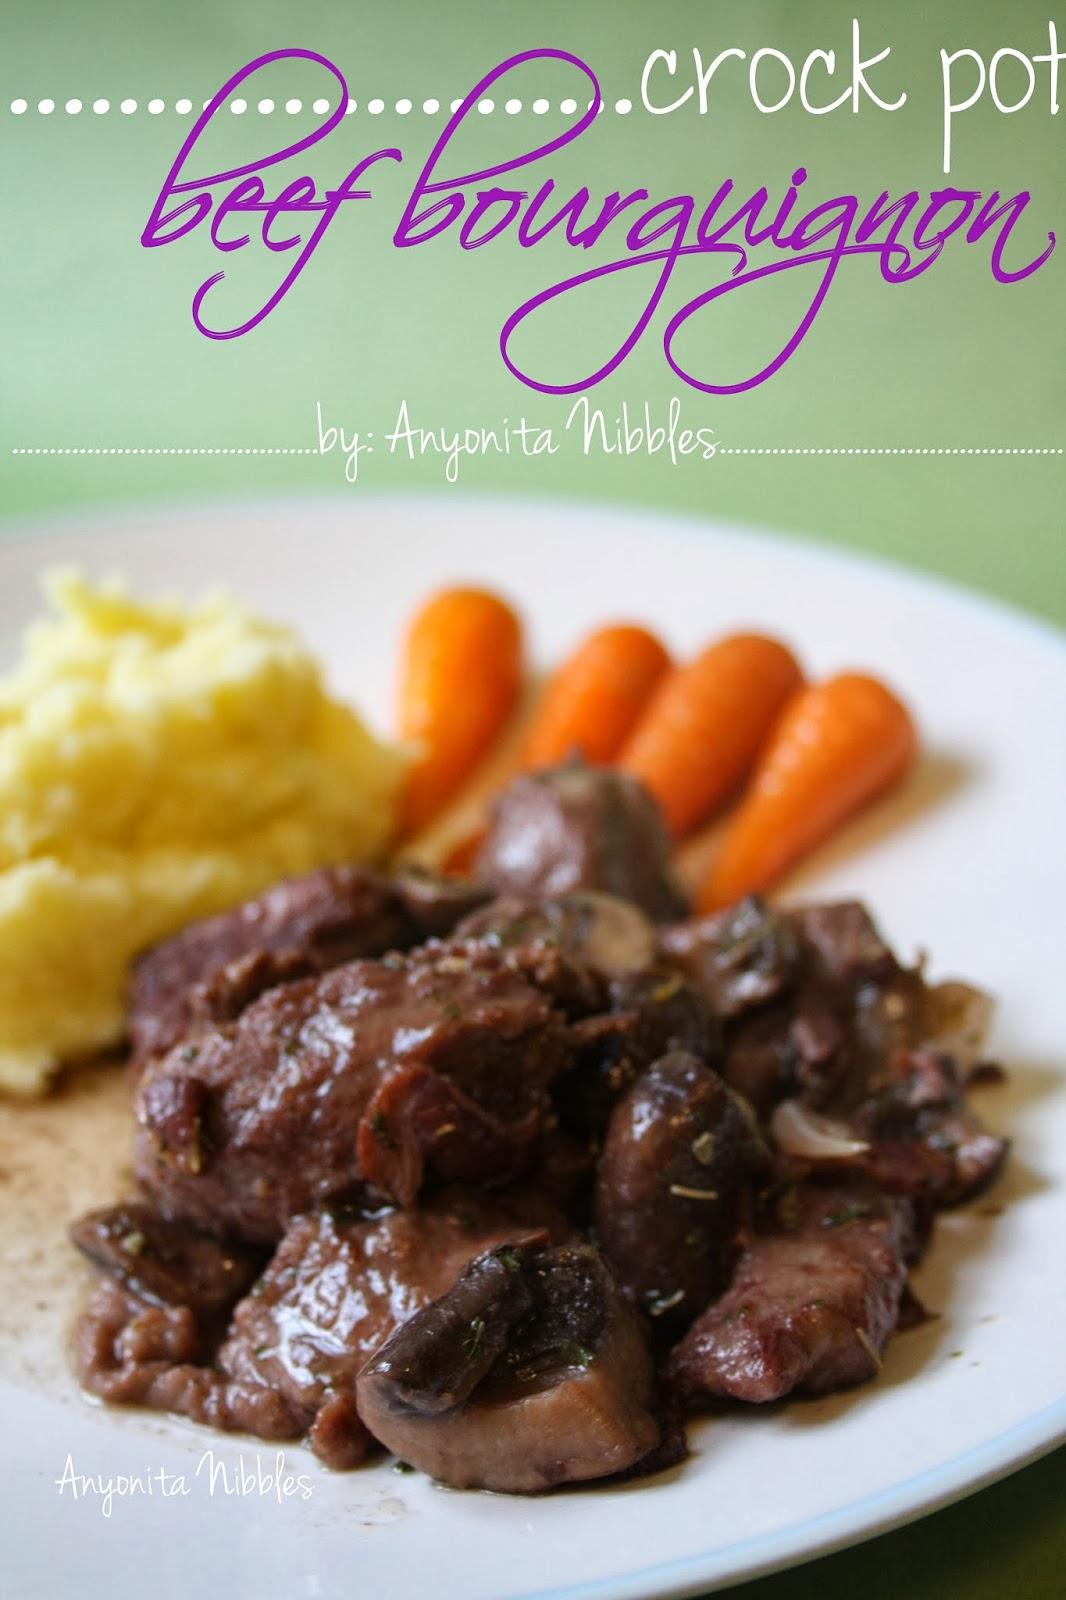 anyonita nibbles gluten free recipes gluten free crock pot beef bourguignon recipe with step